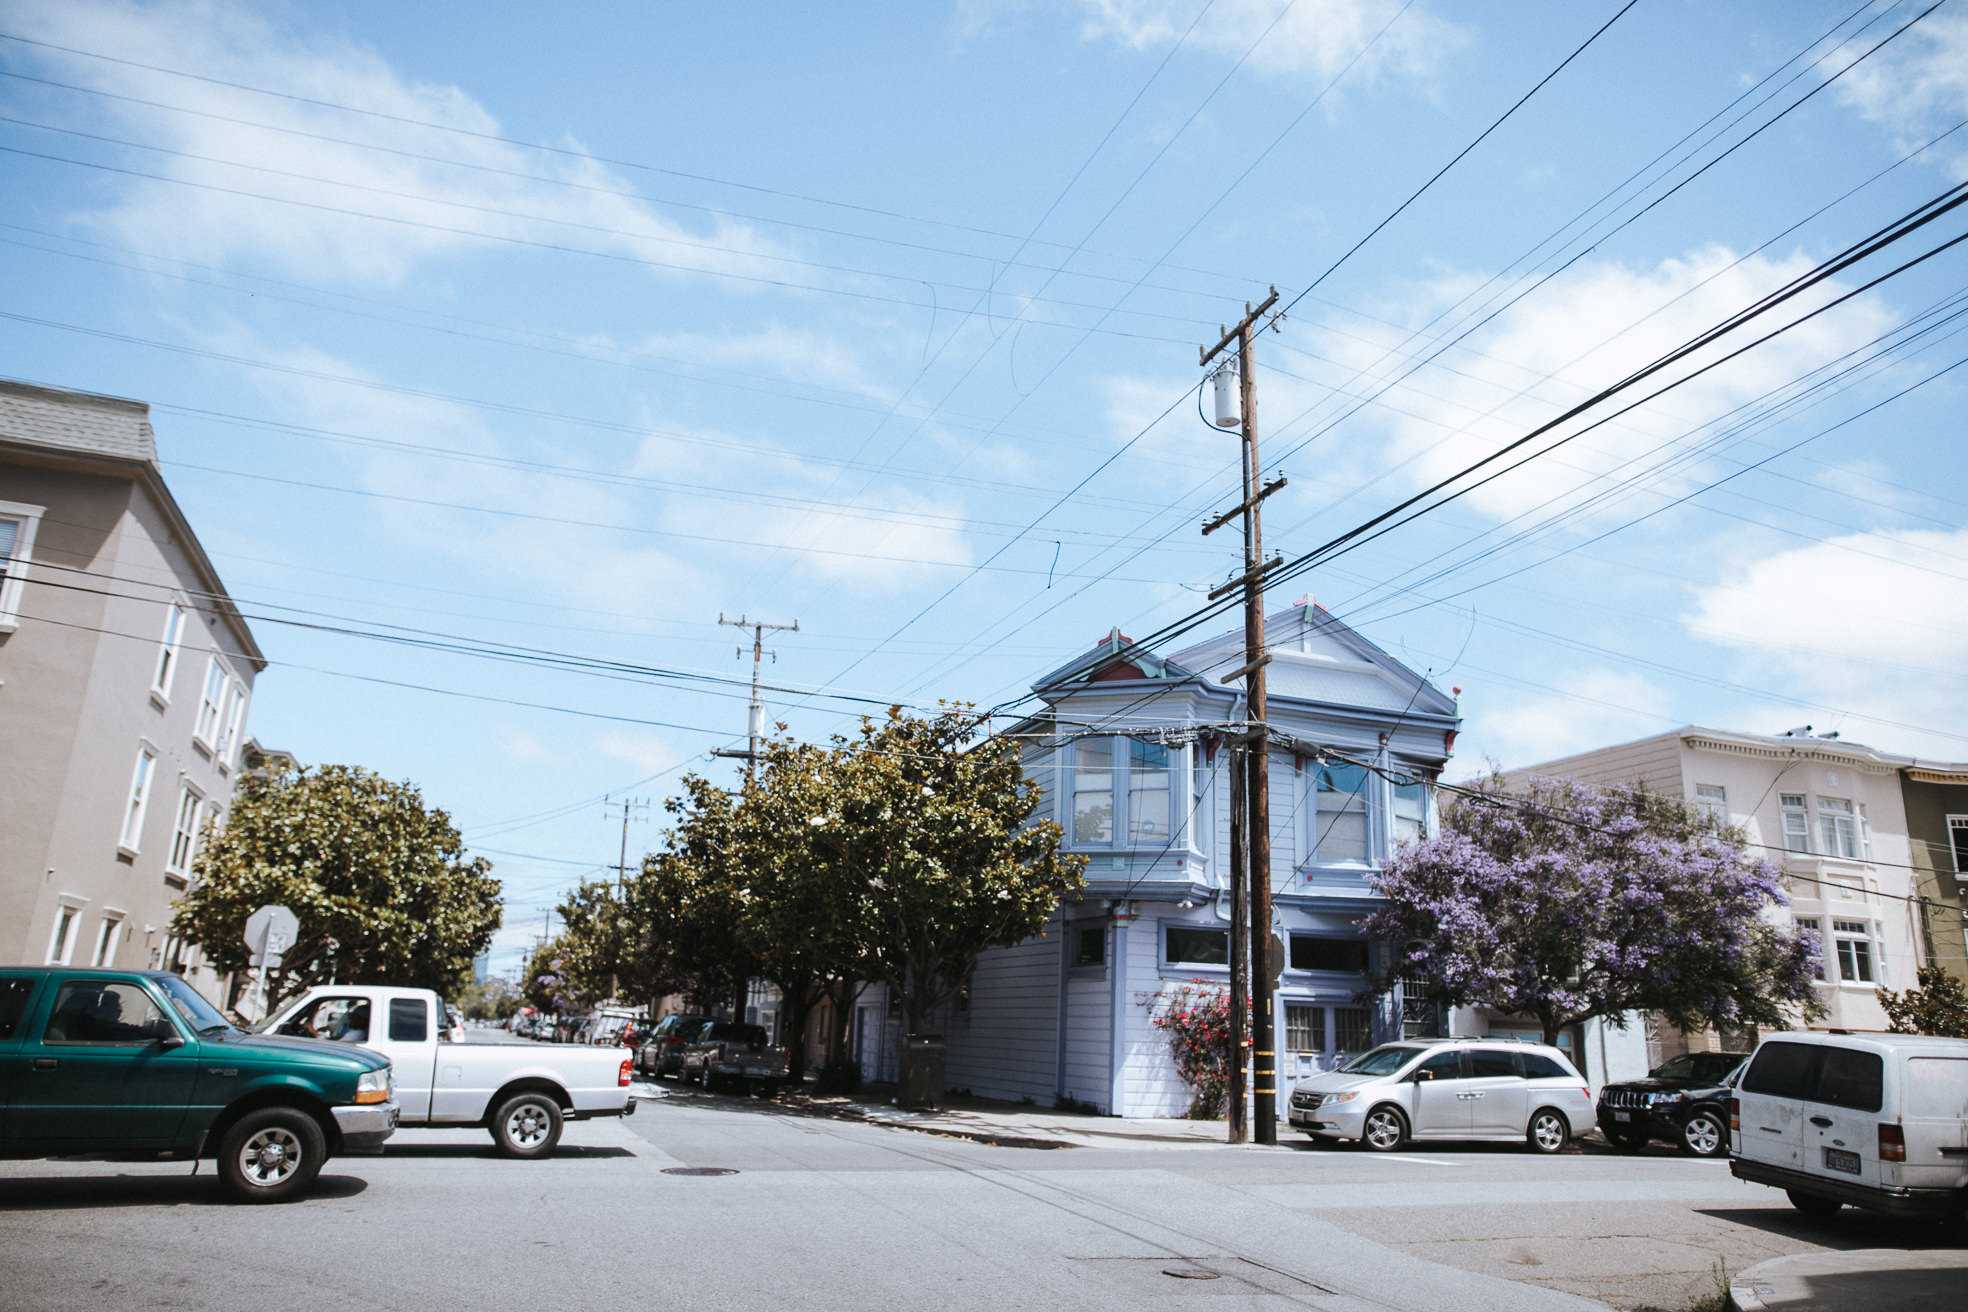 San-Francisco-BildervomLeben-4942